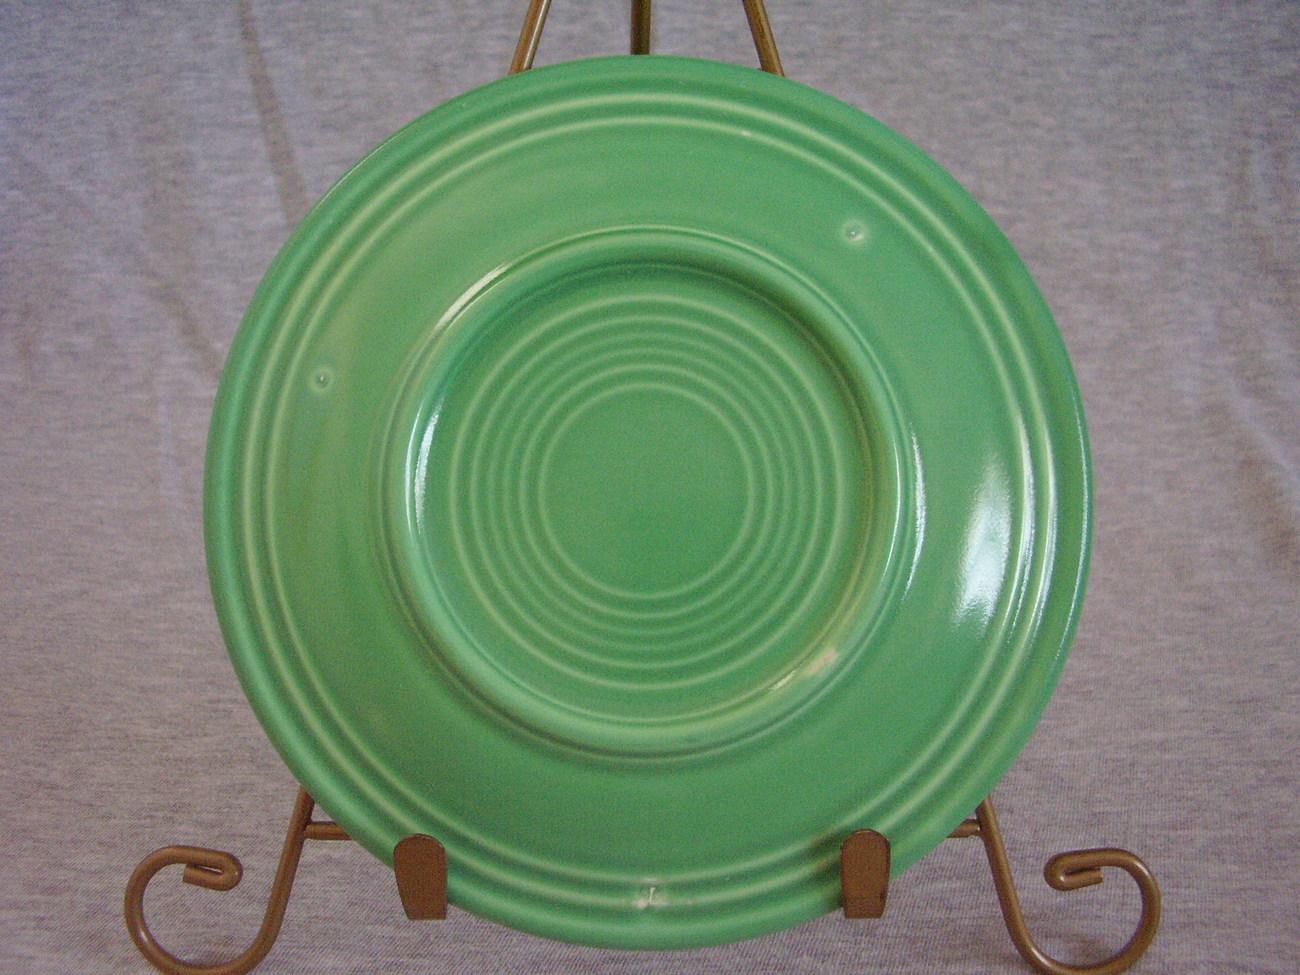 Vintage Fiestaware Original Green Bread Butter Plate B